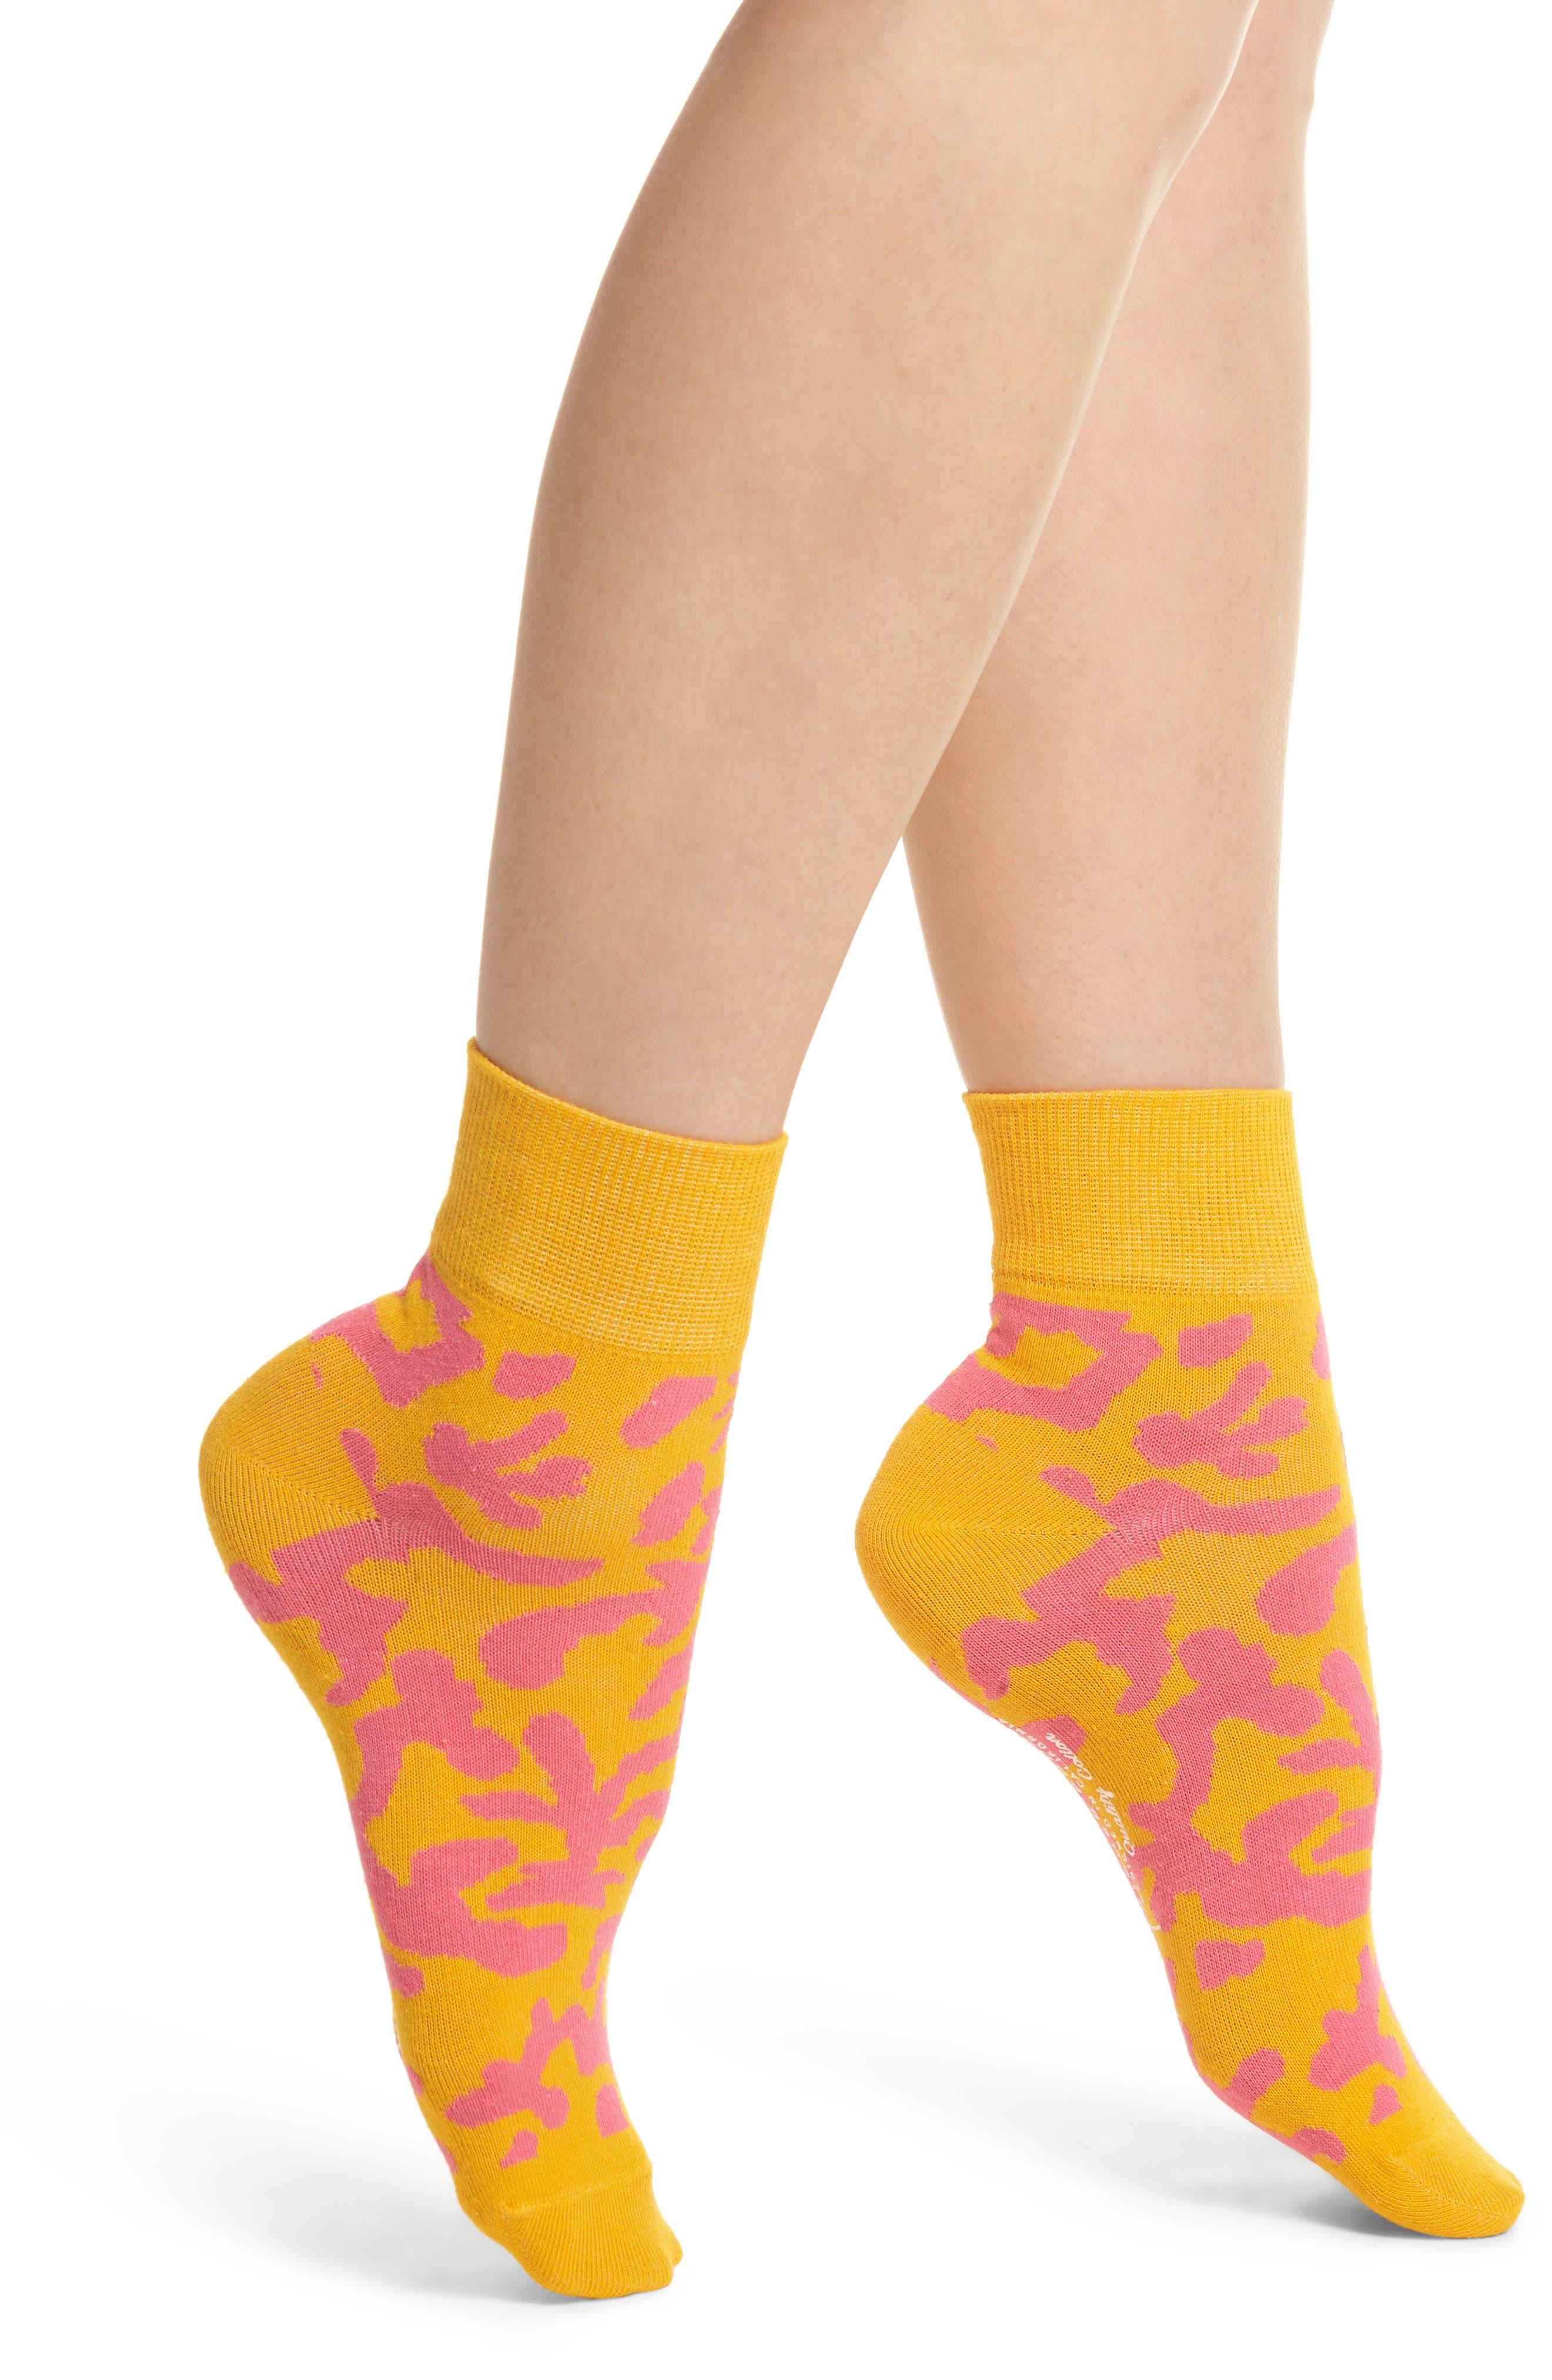 Coral Will Bryant Crew Socks,                         Main,                         color, Orange